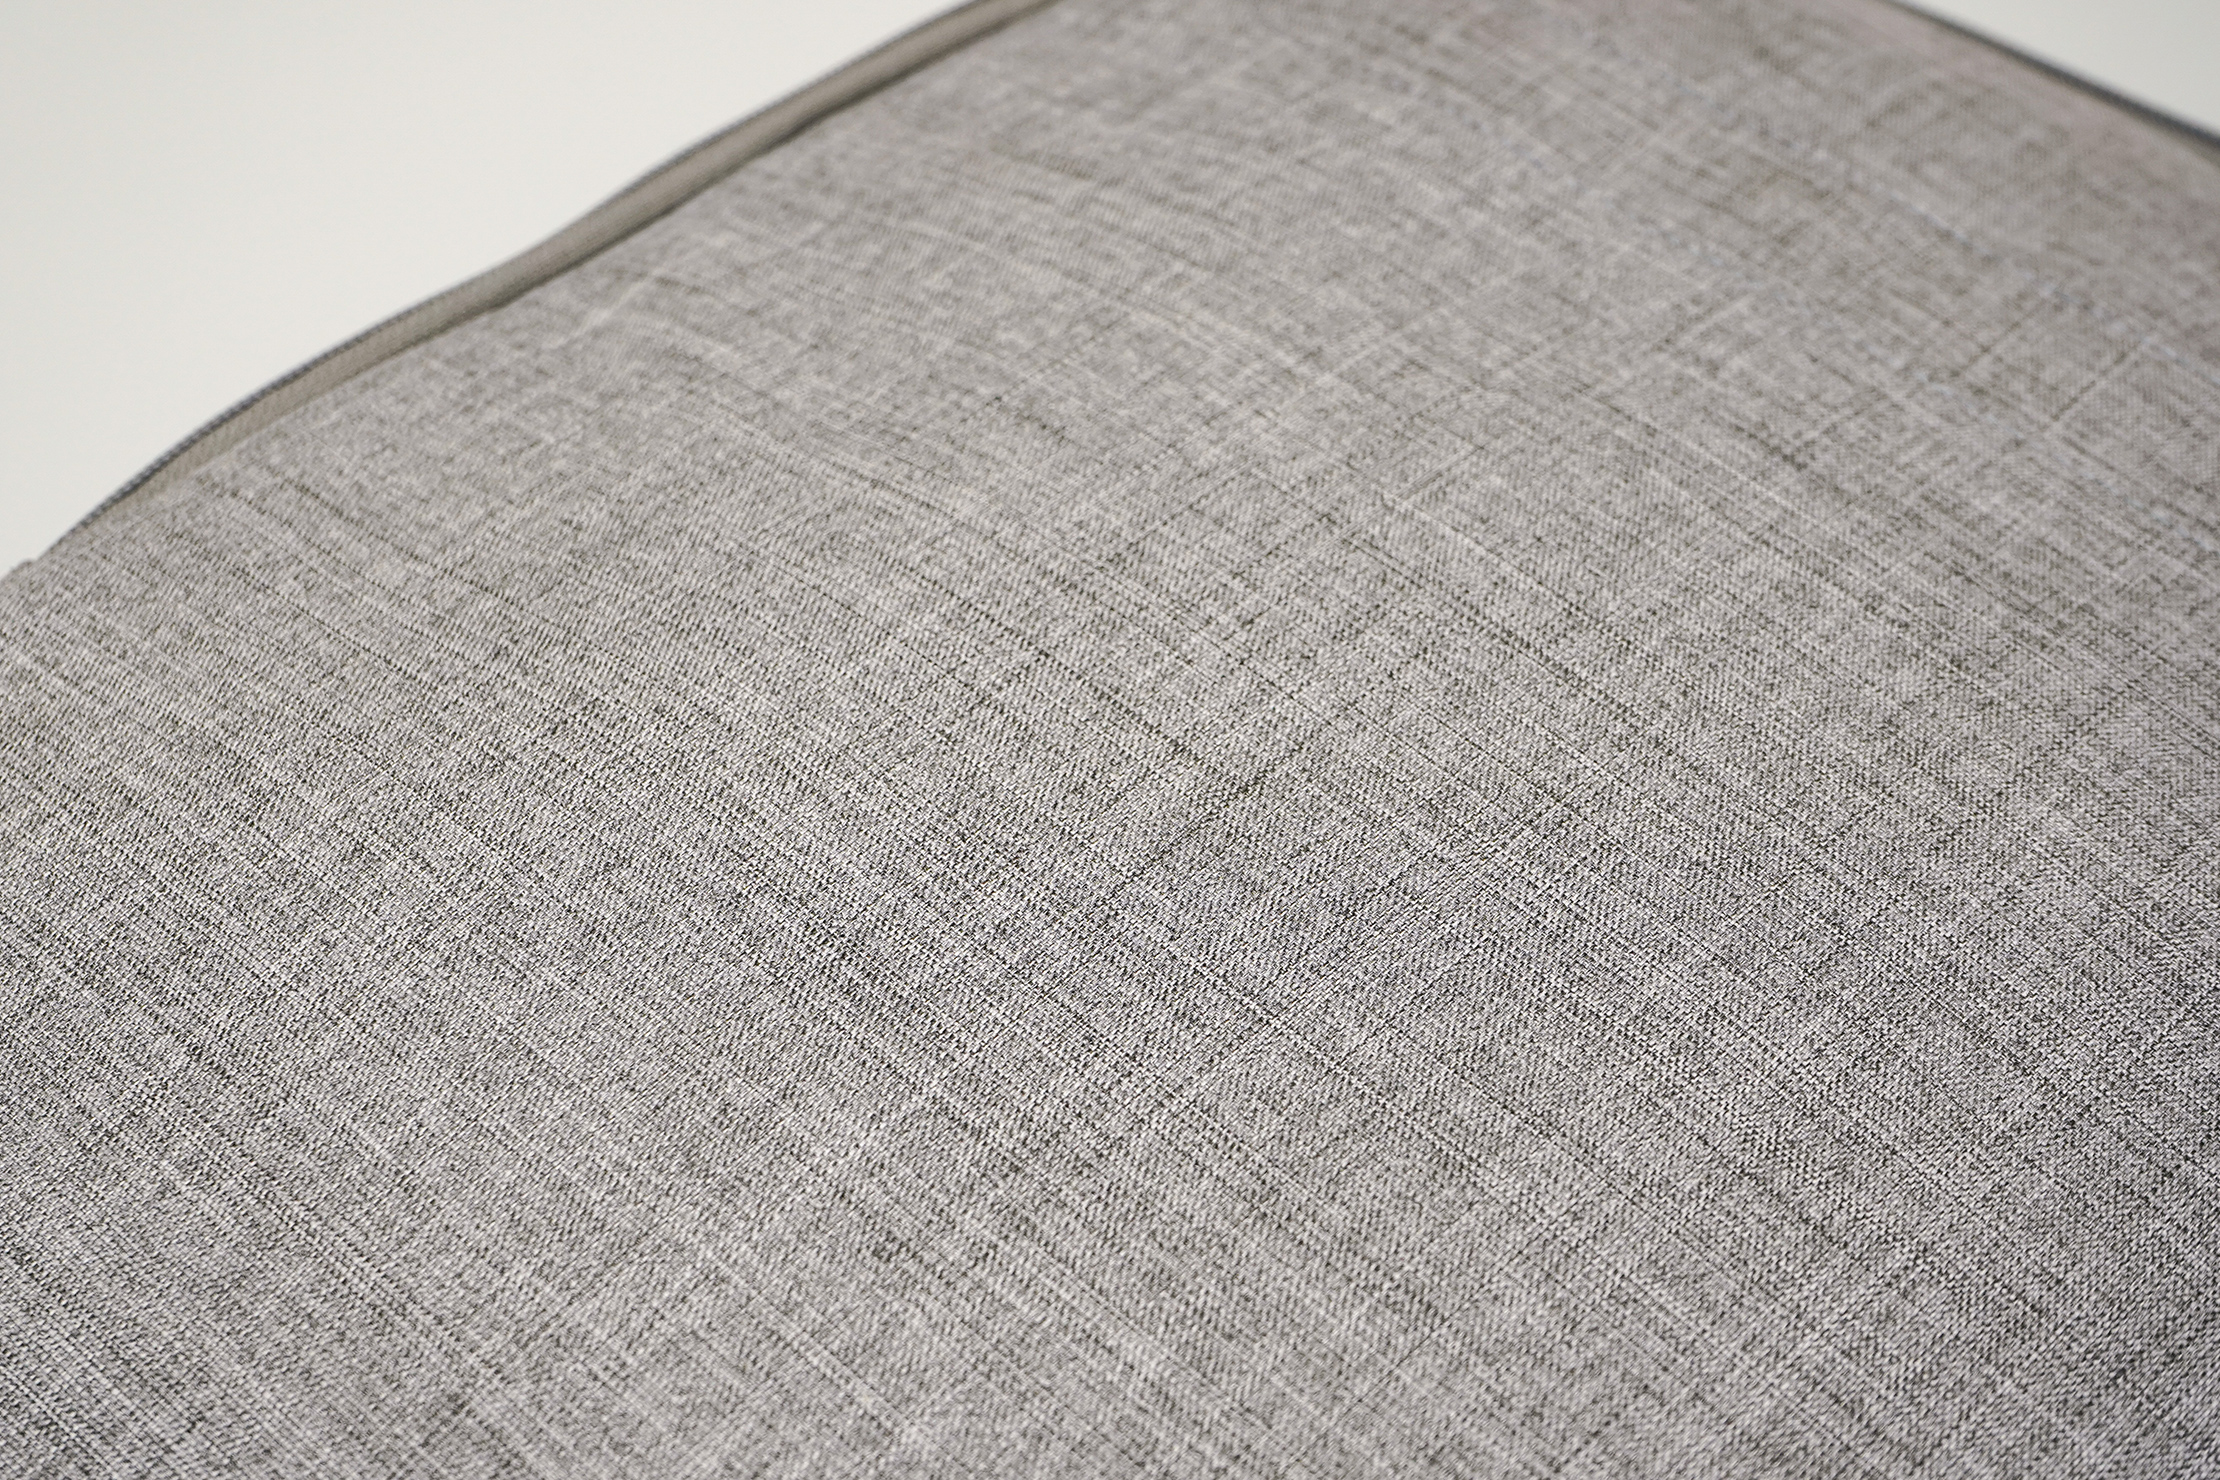 AmazonBasics Slim Travel Backpack Weekender Polyester Material